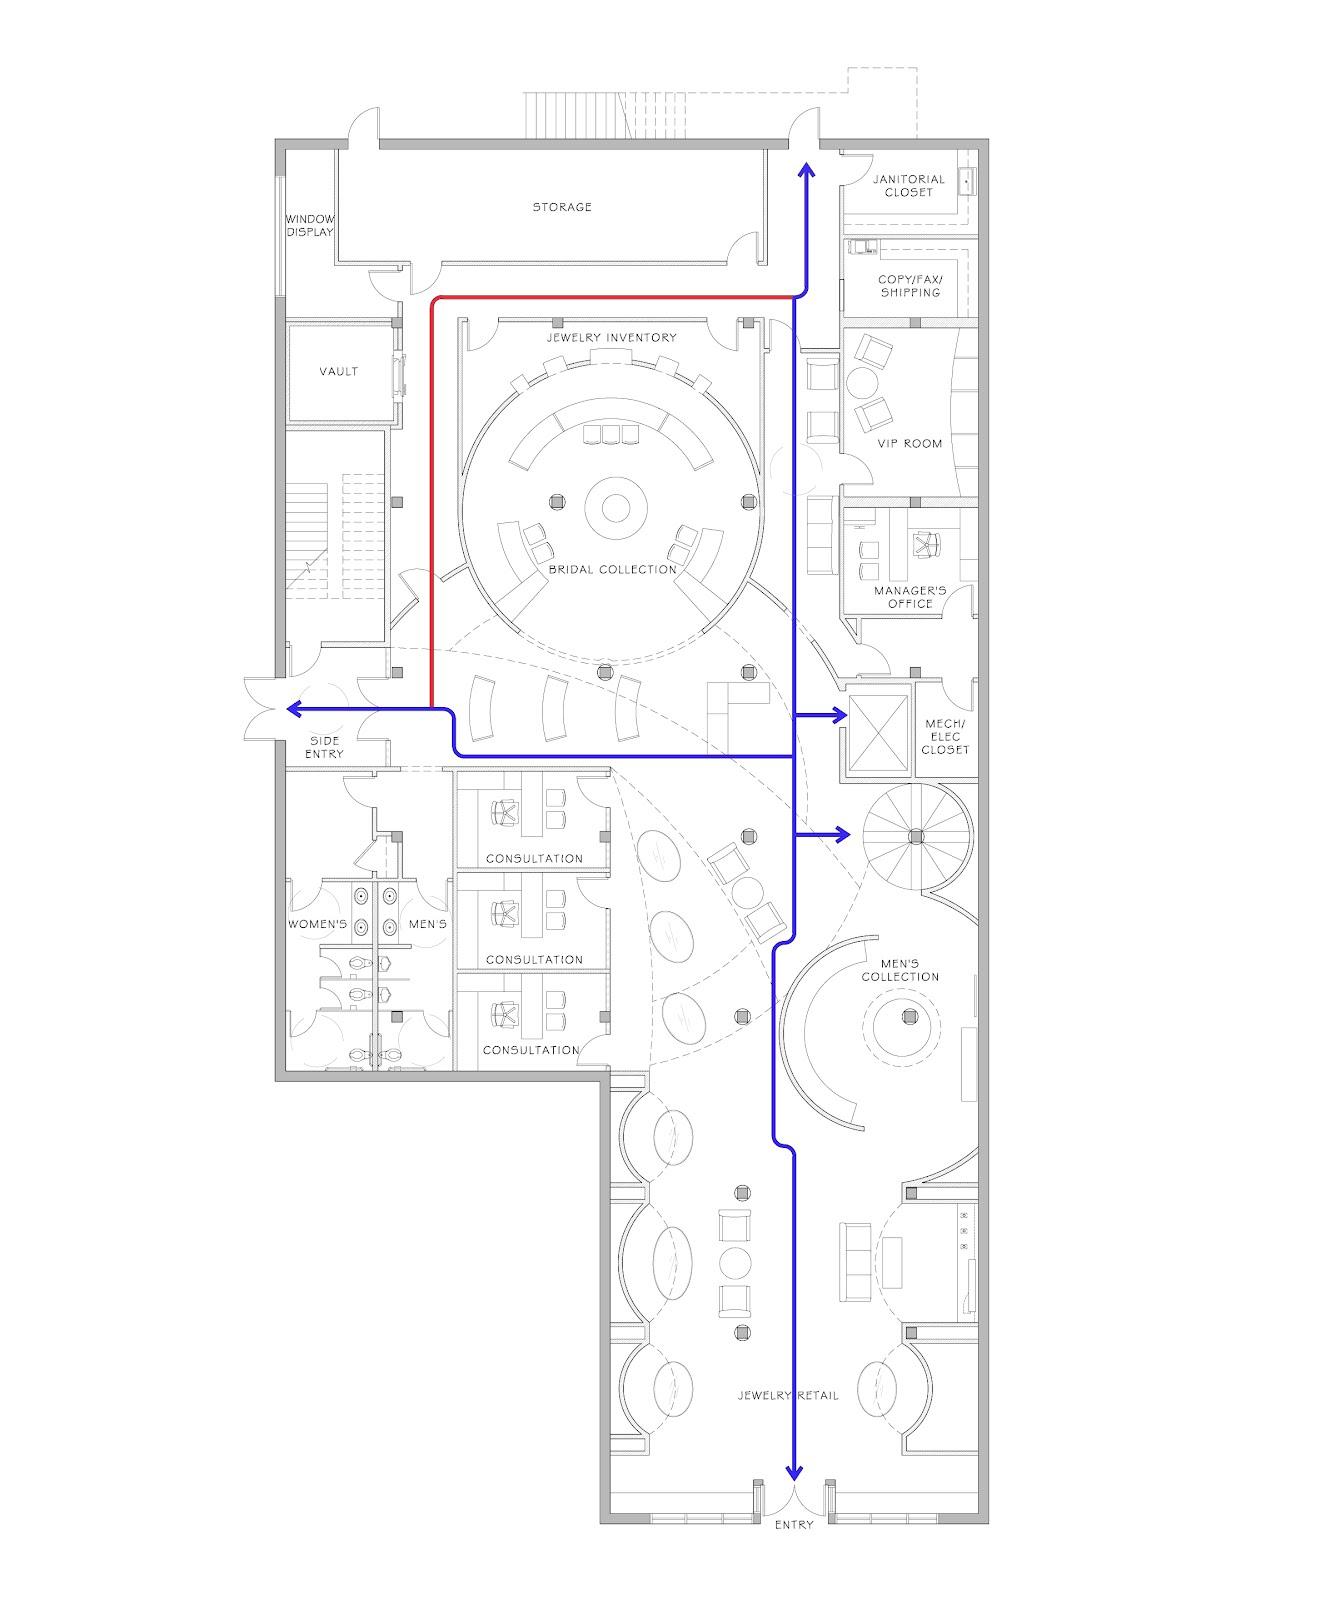 Senior Capstone Project Revised Circulation Diagrams